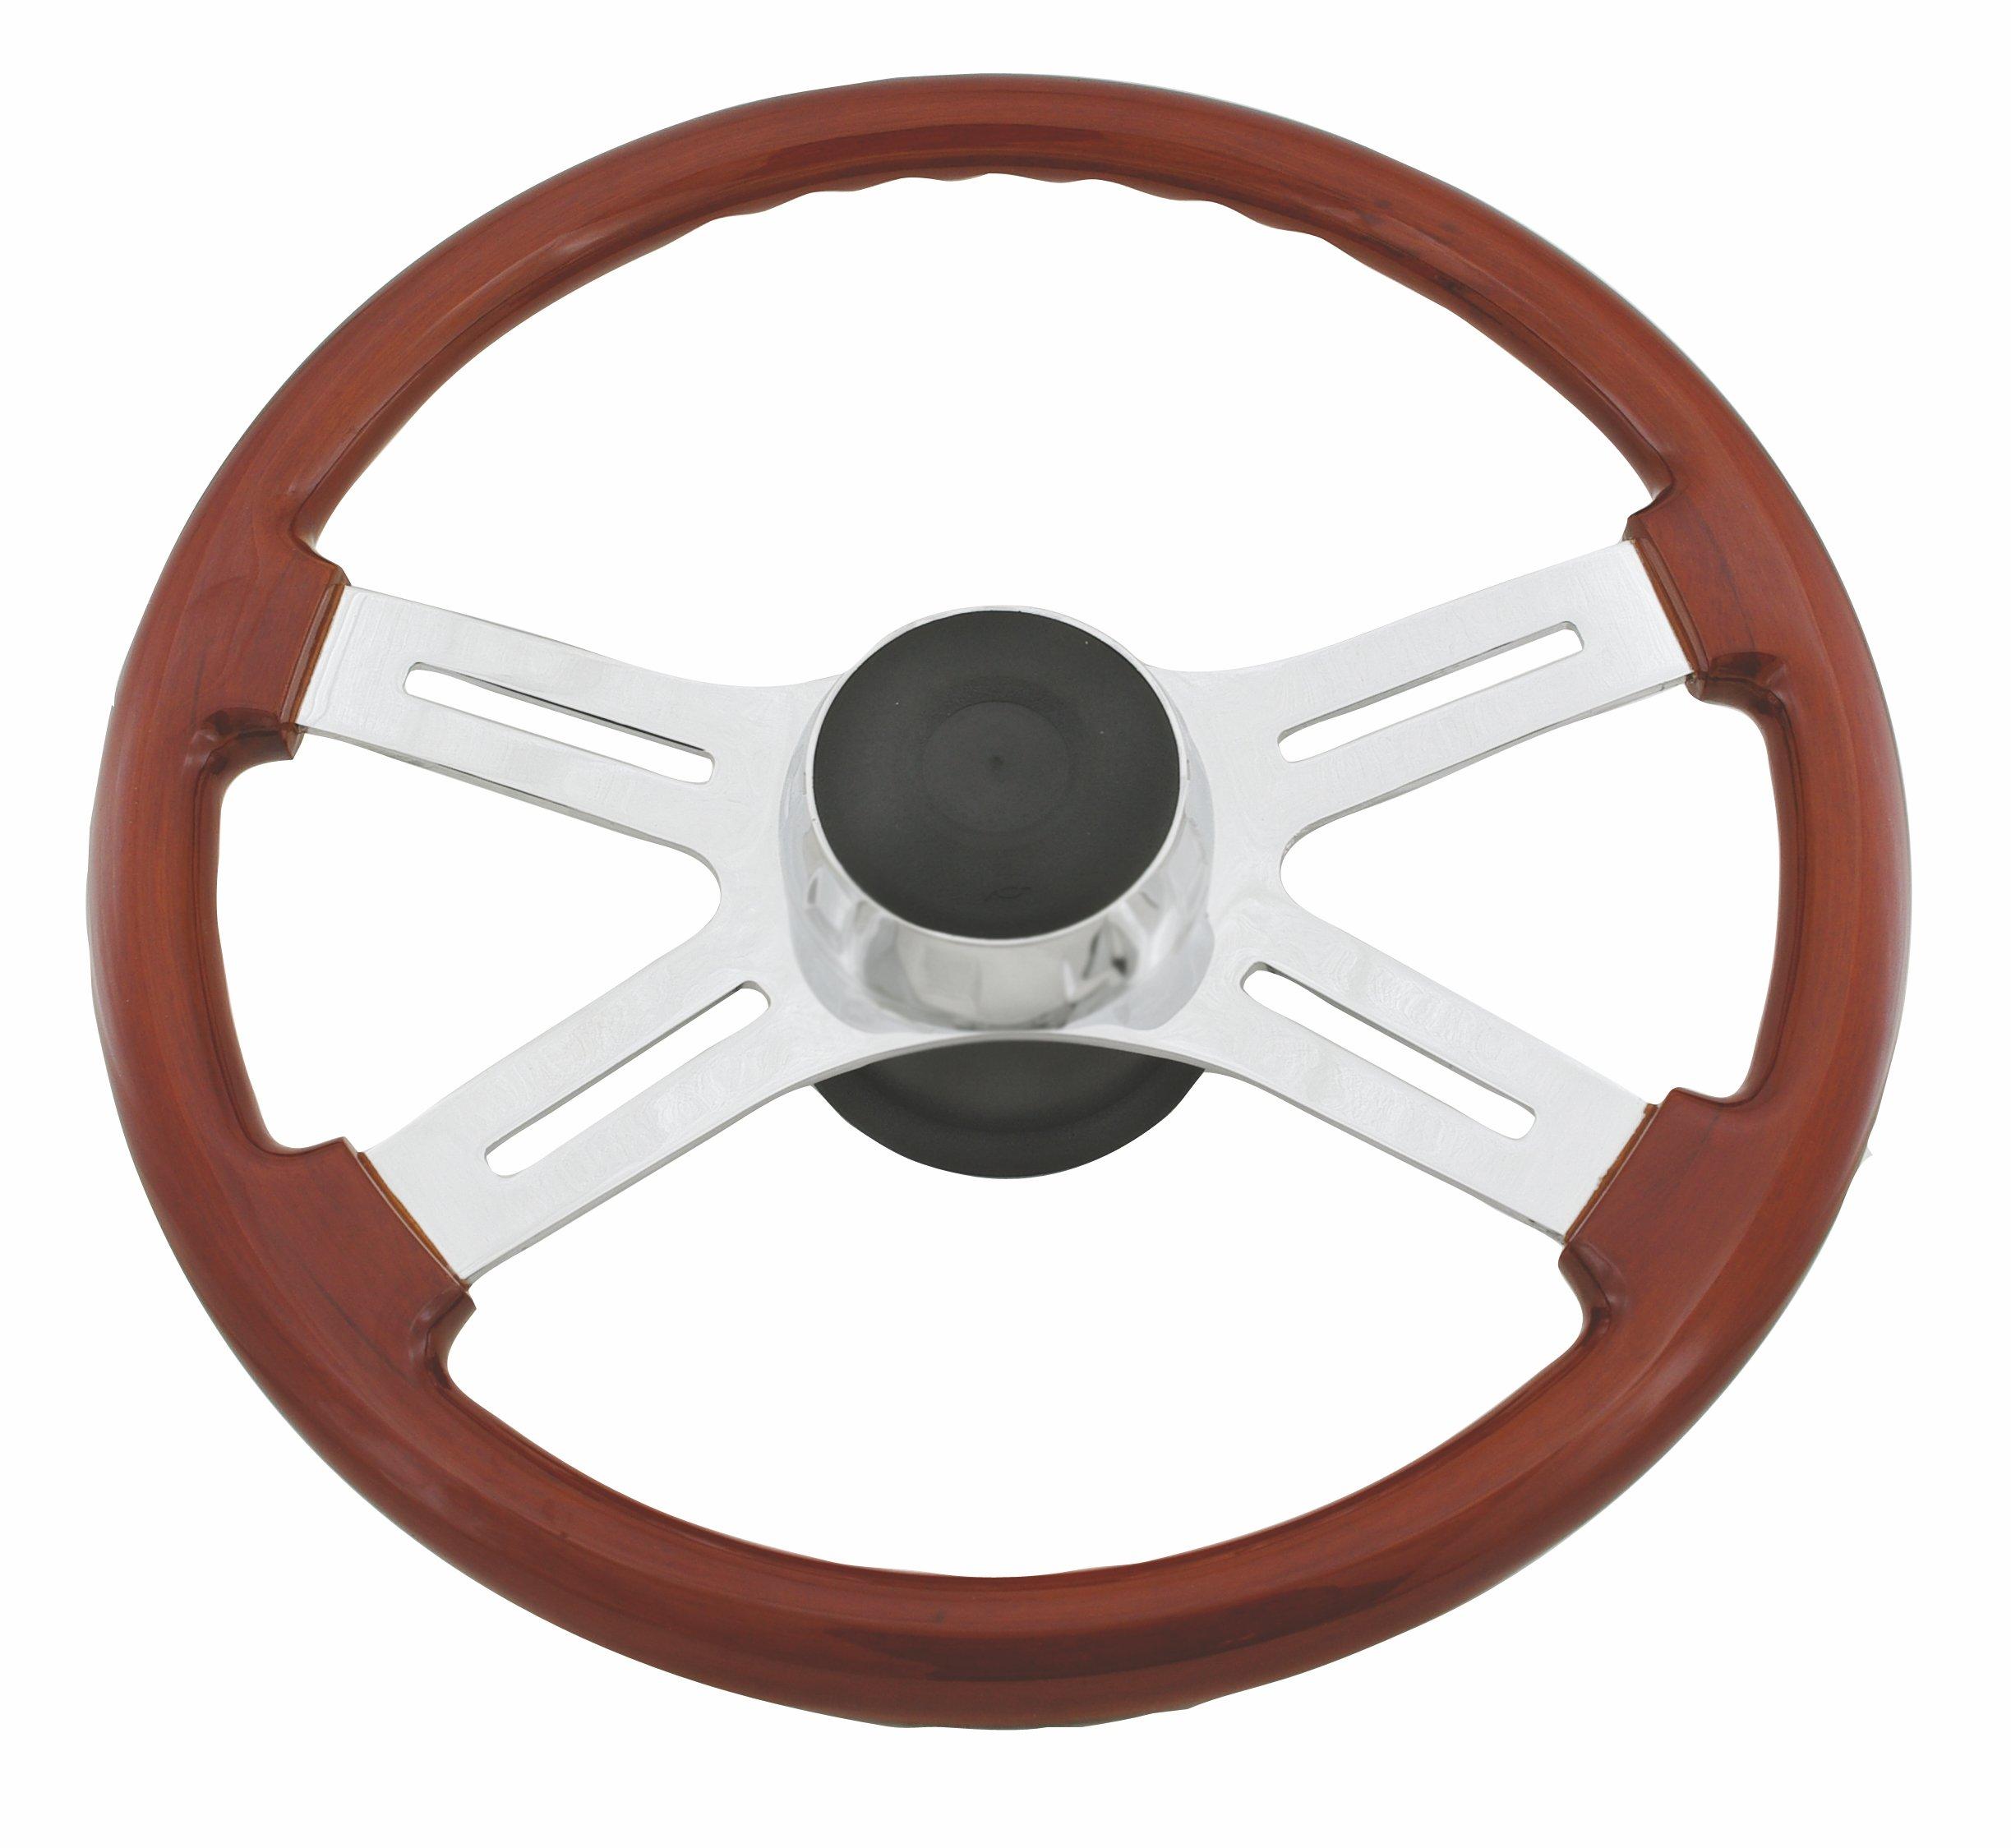 Woody's WP-SWKW Rosewood Chrome Truck Steering Wheel (Beautiful African Hardwood)